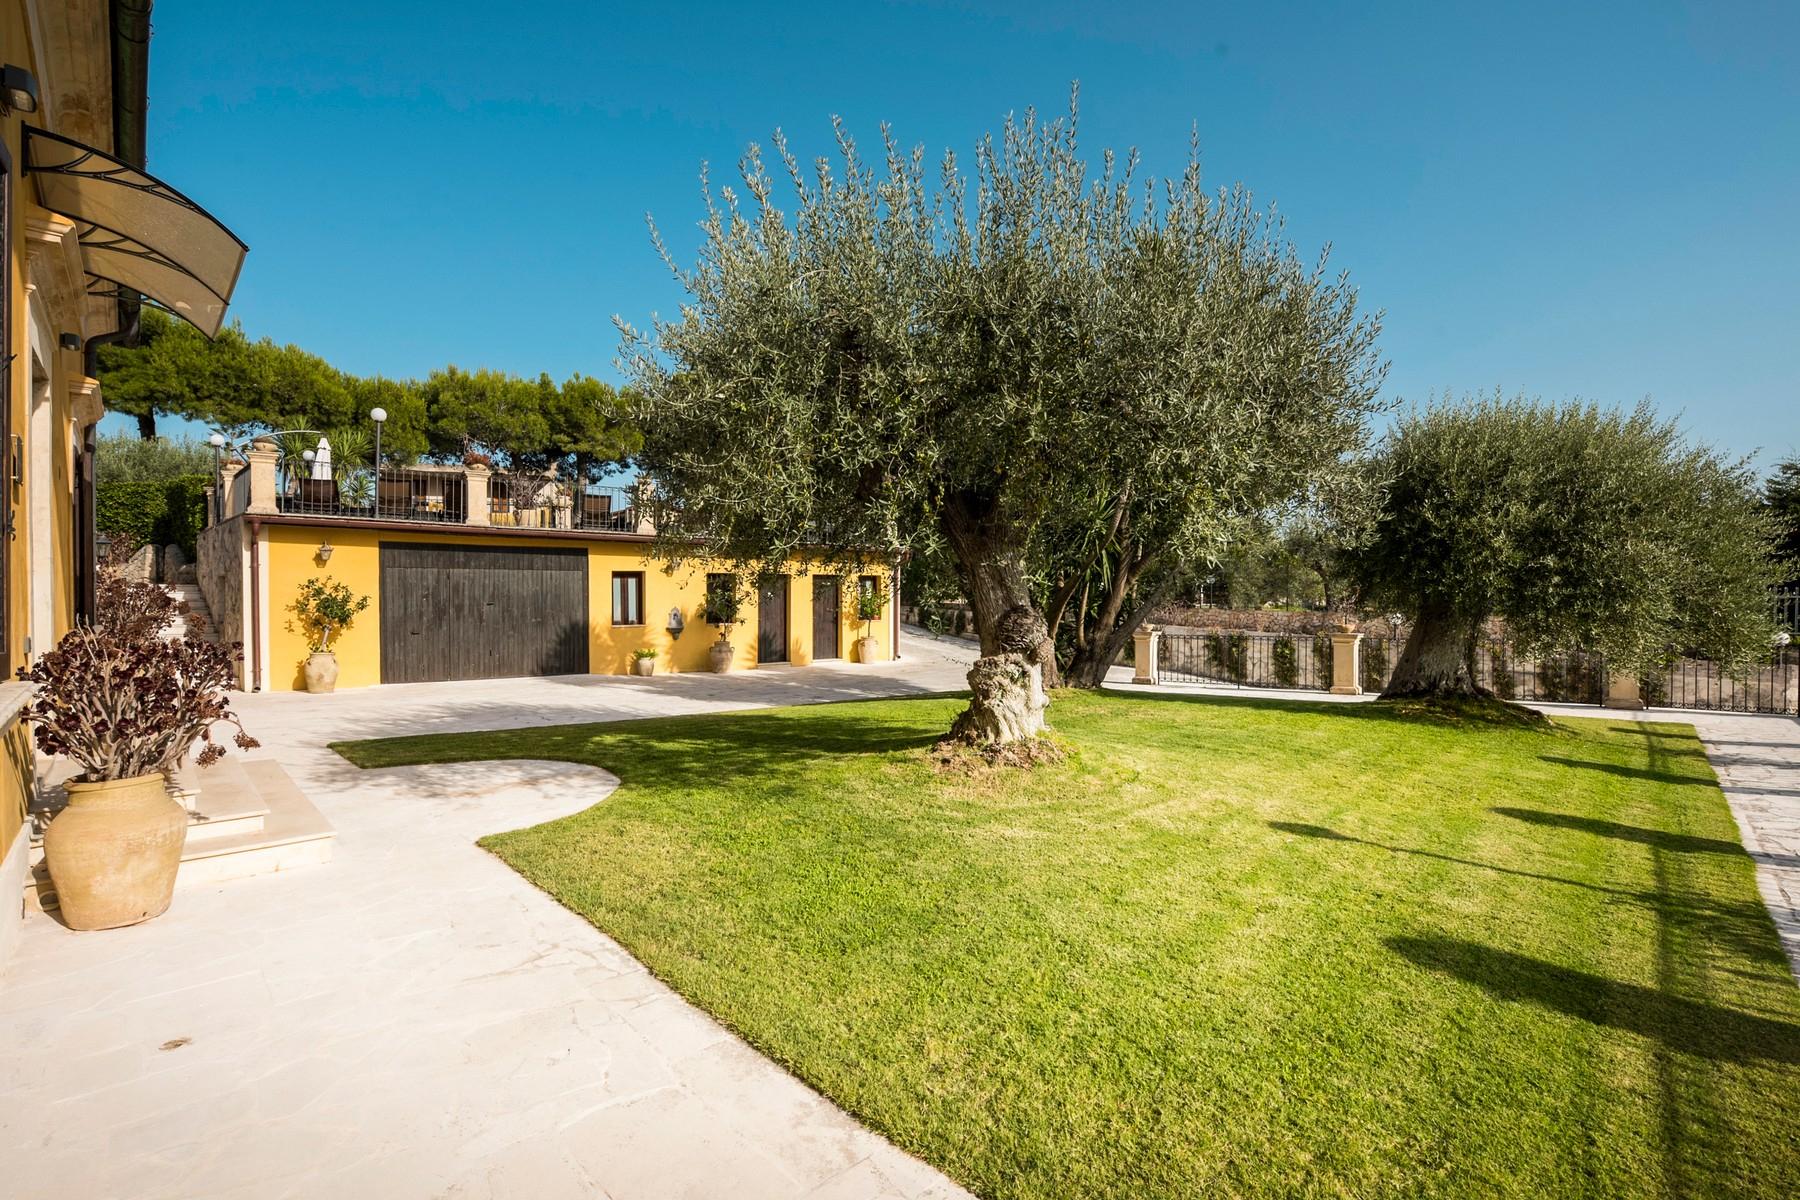 Casa indipendente in Vendita a Noto: 5 locali, 300 mq - Foto 2